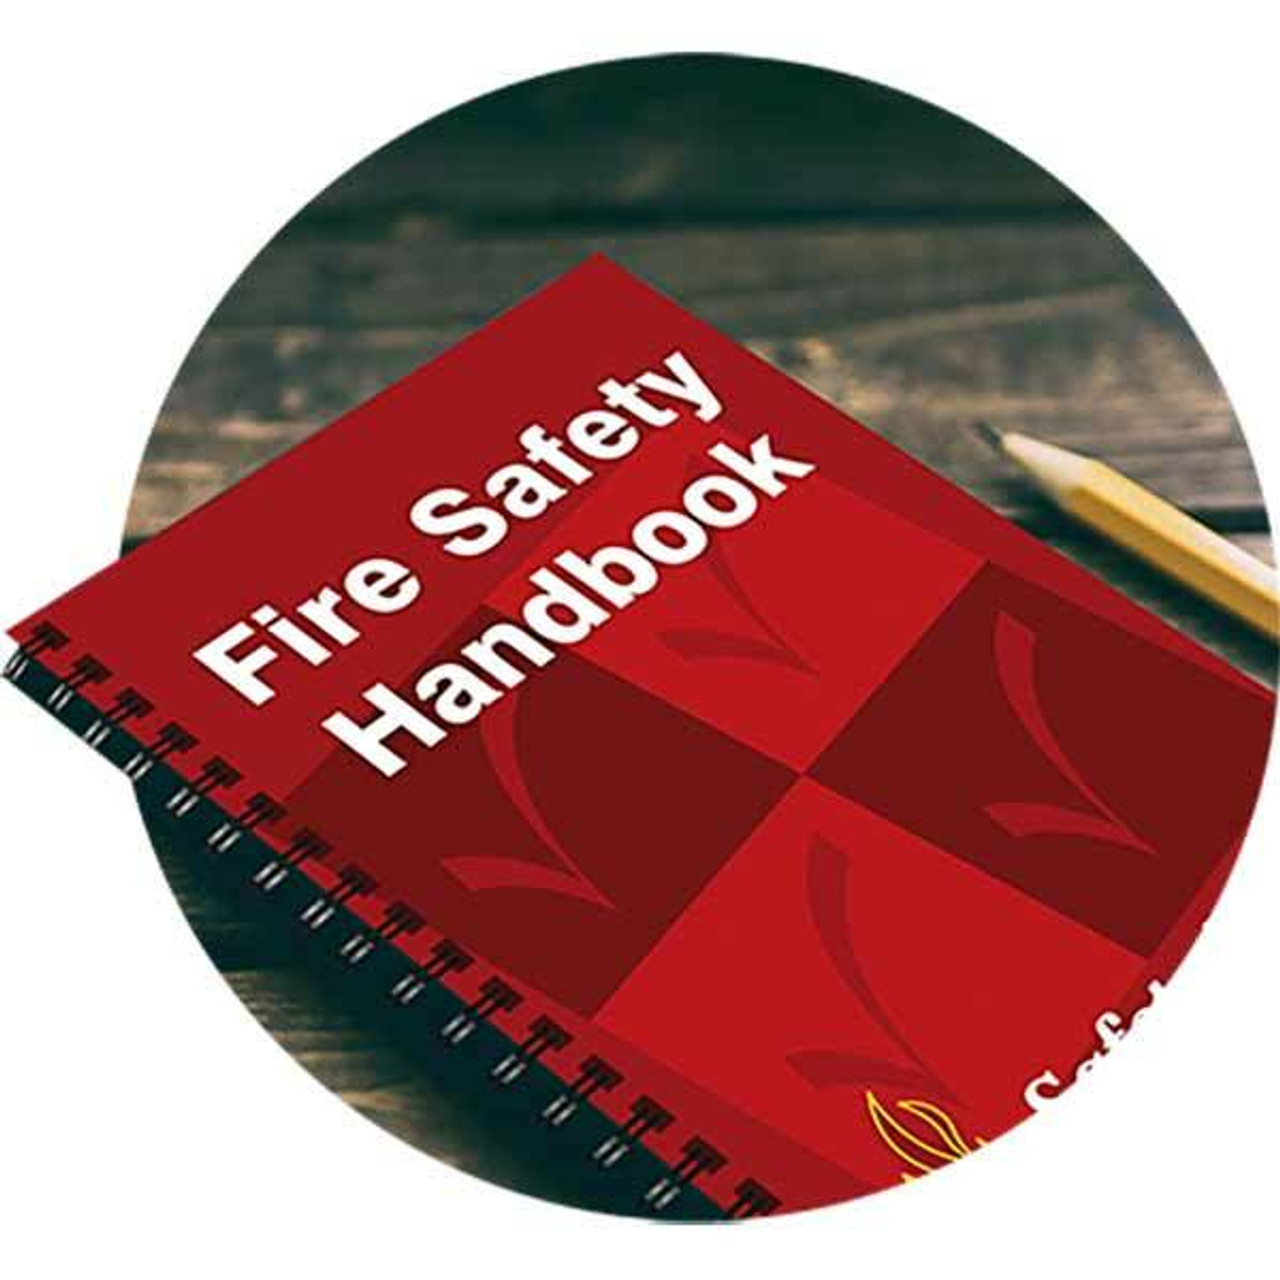 Log Books, Compliance & Codes